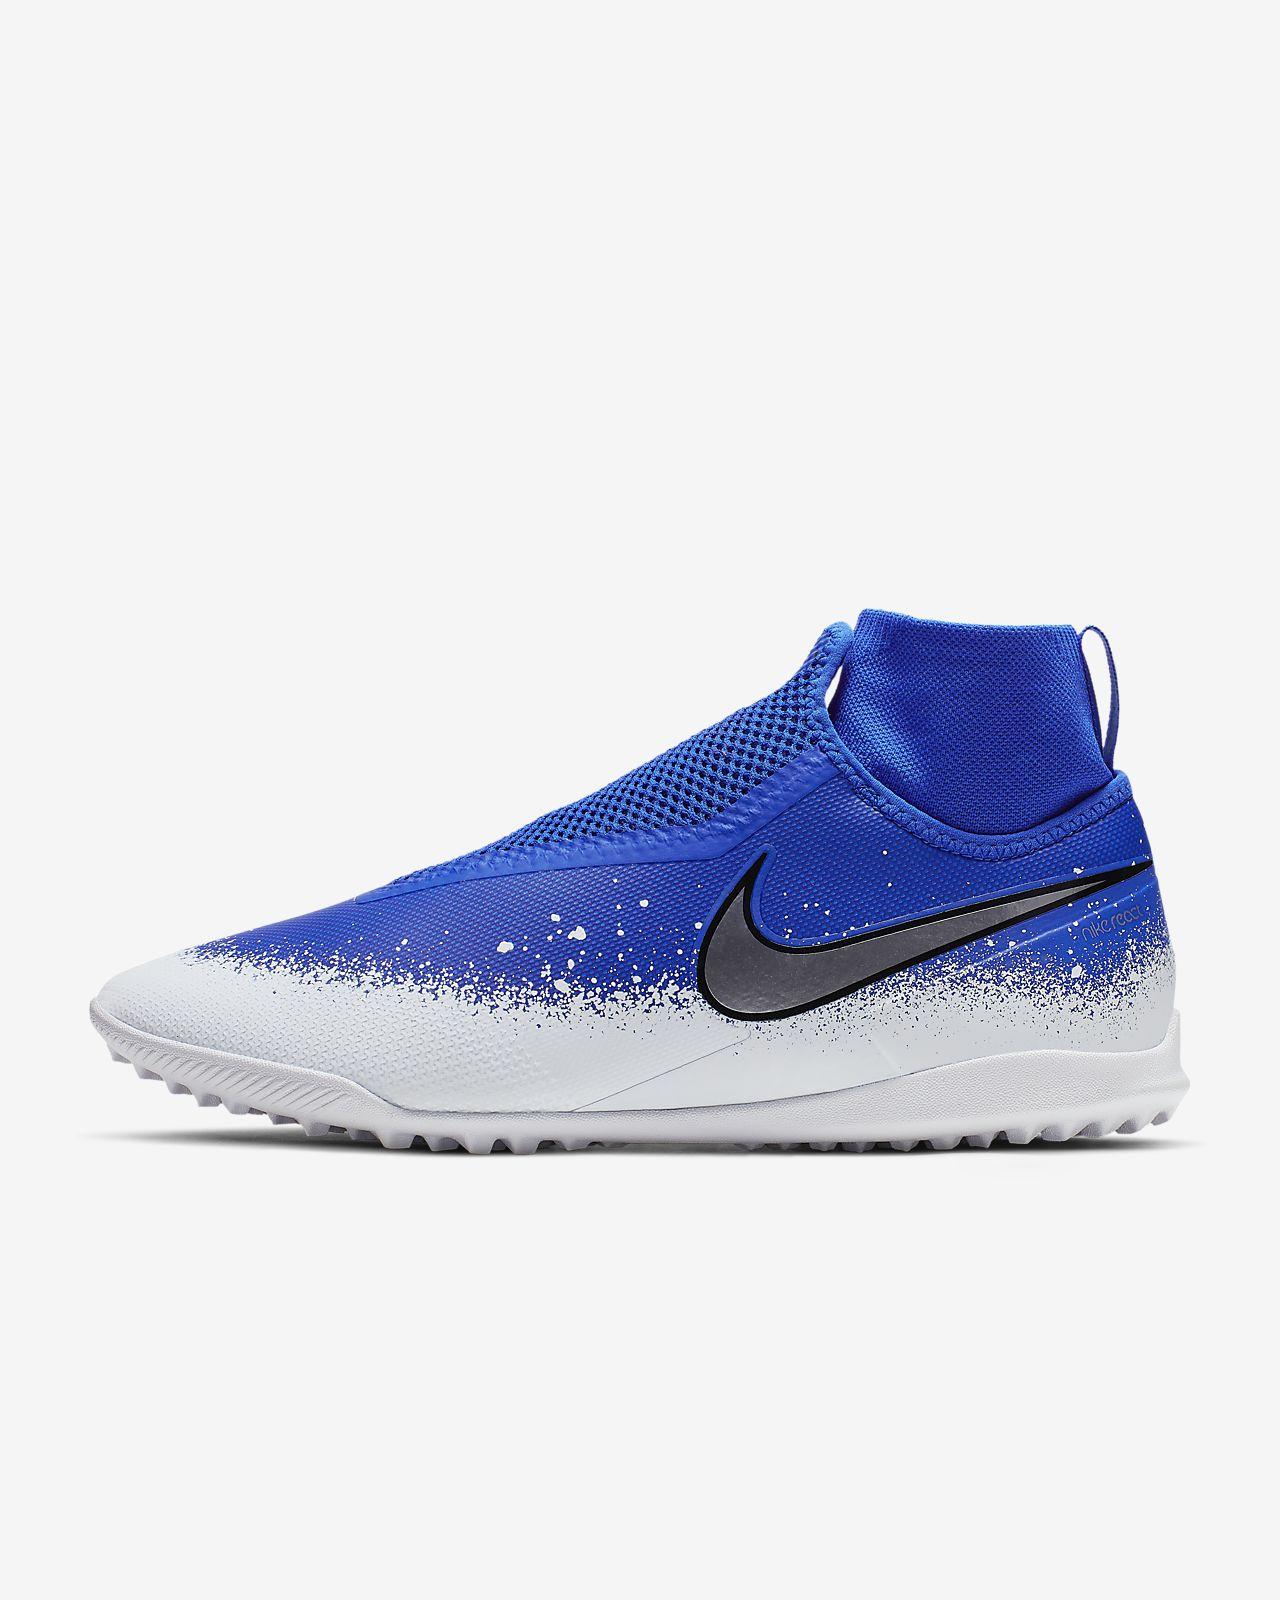 sale retailer 64ee1 23bc5 ... Fotbollssko för grus turf Nike React Phantom Vision Pro Dynamic Fit TF